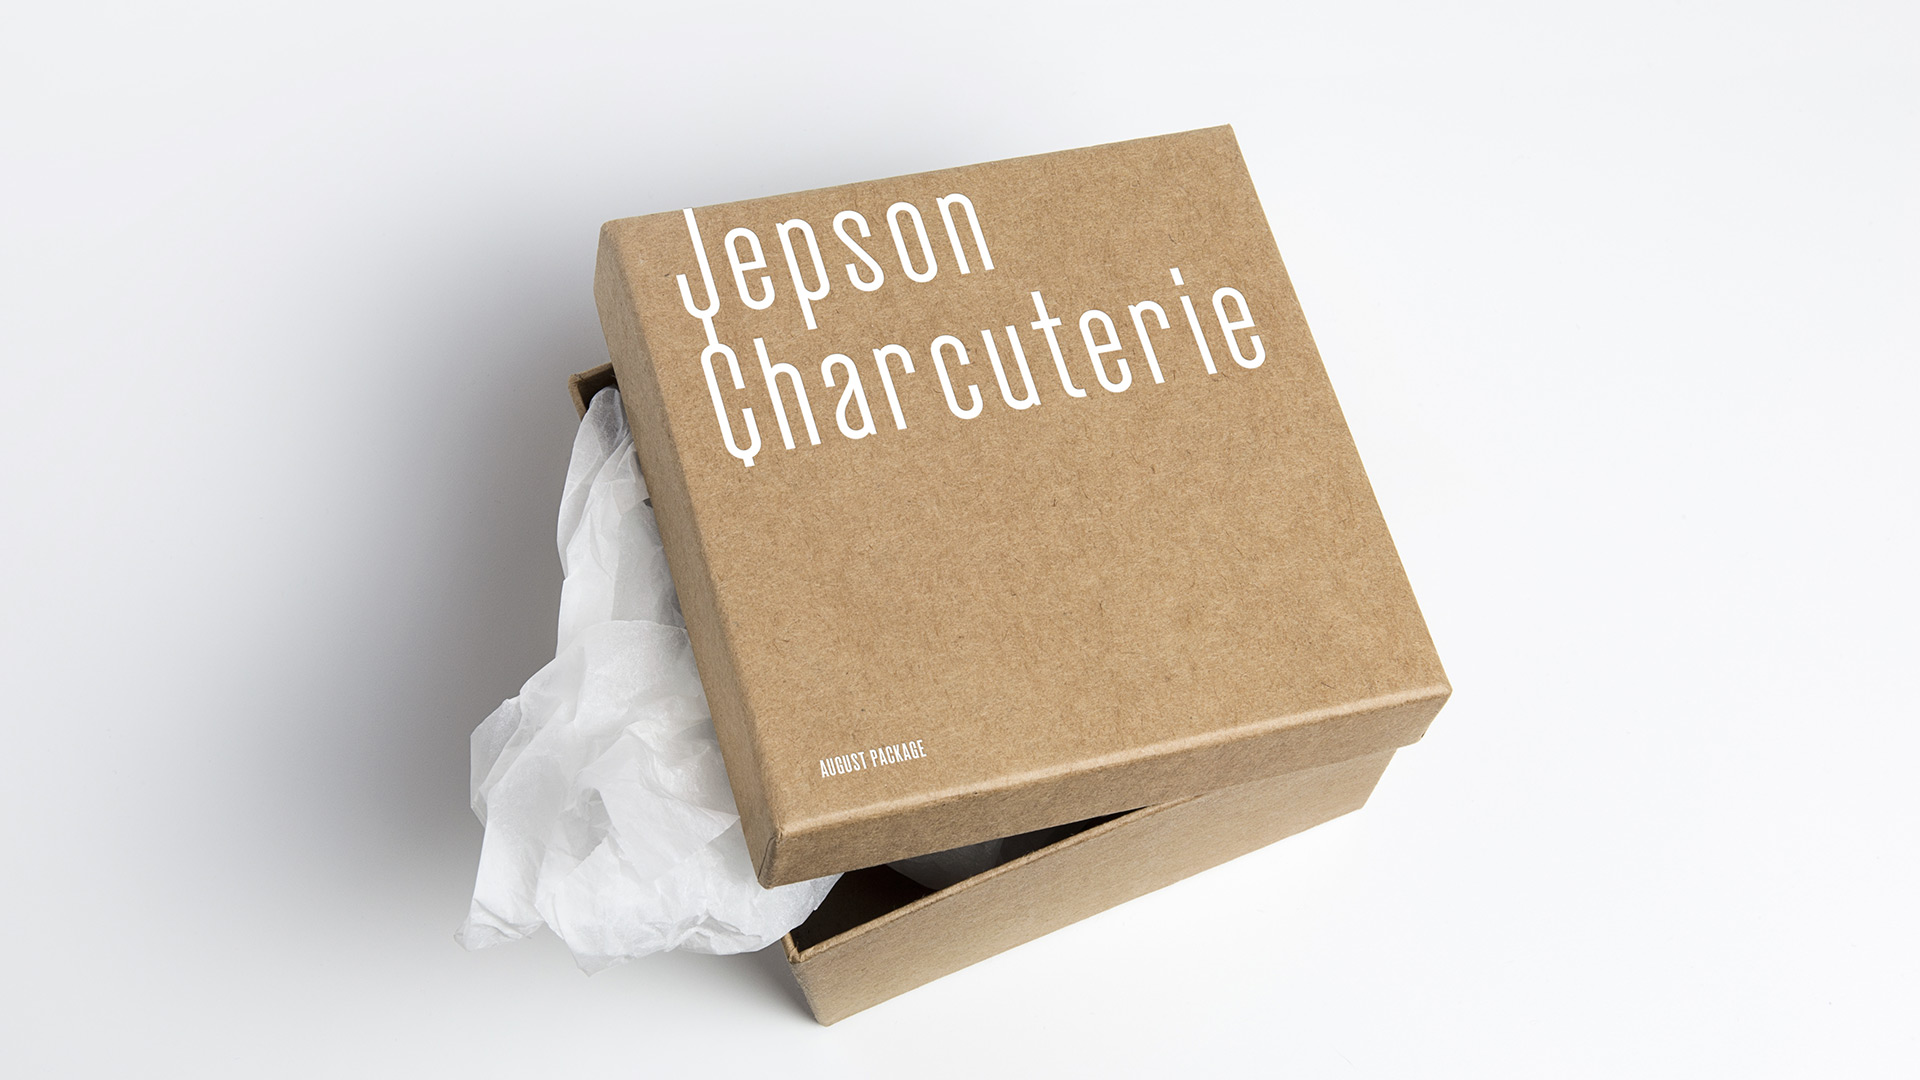 Jepson Charcuteri - Visuel Identitet - Box